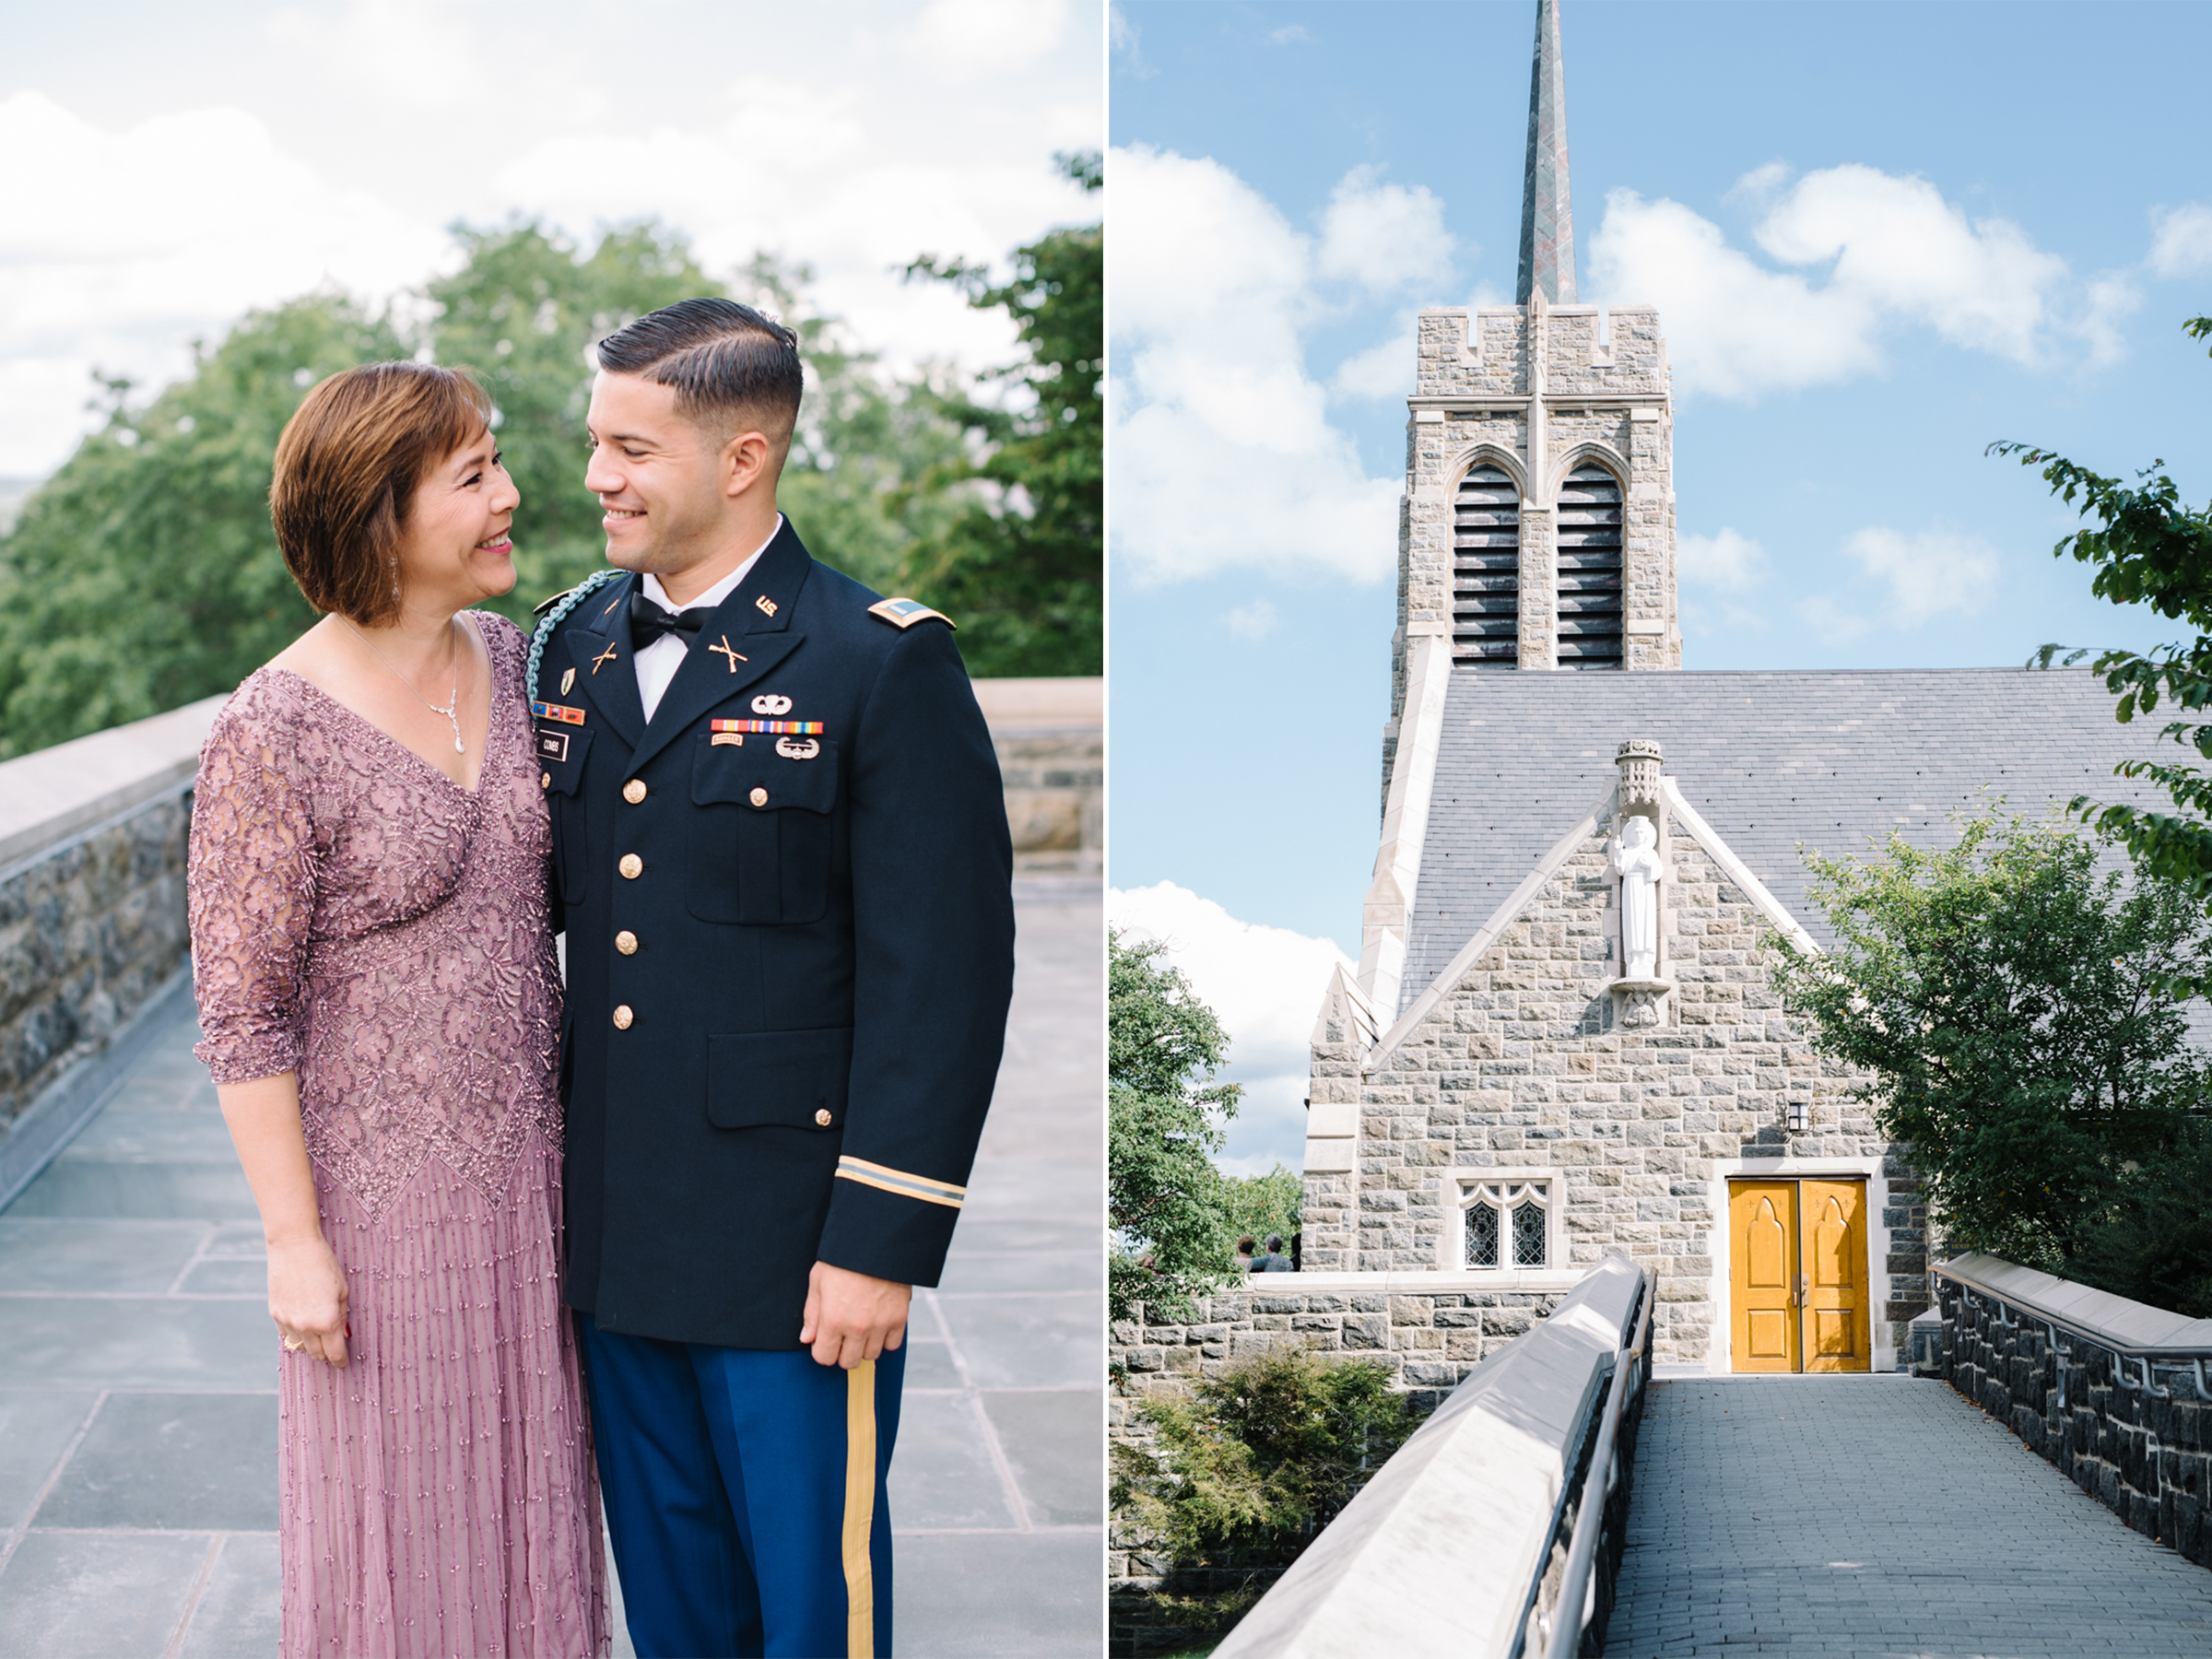 Military Wedding- West Point Army Academy-Most Holy Trinity Church- Olivia Christina Photo.jpg